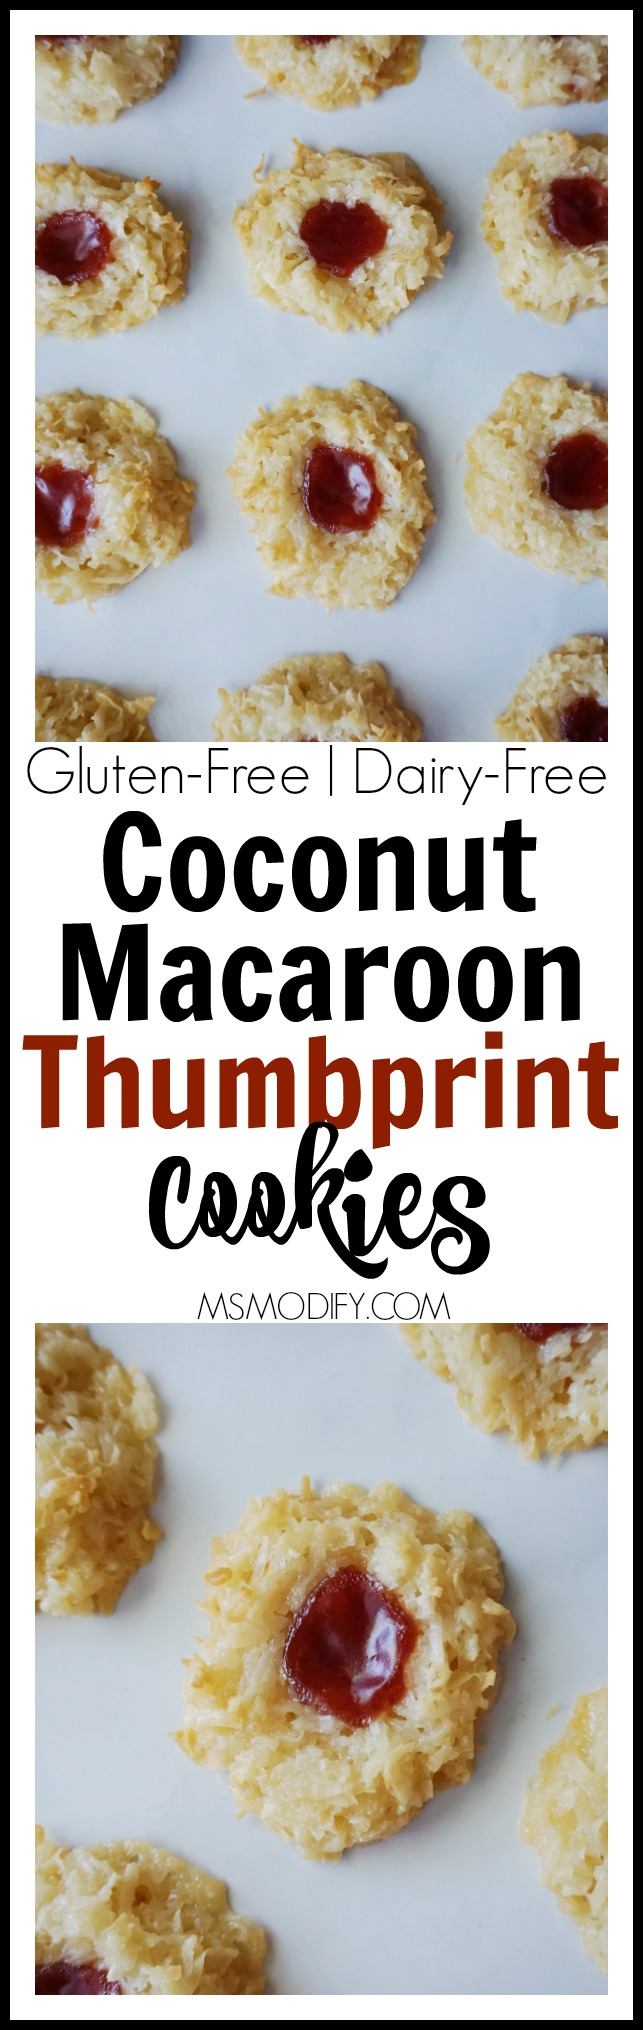 Coconut Macaroon Thumbprint Cookies